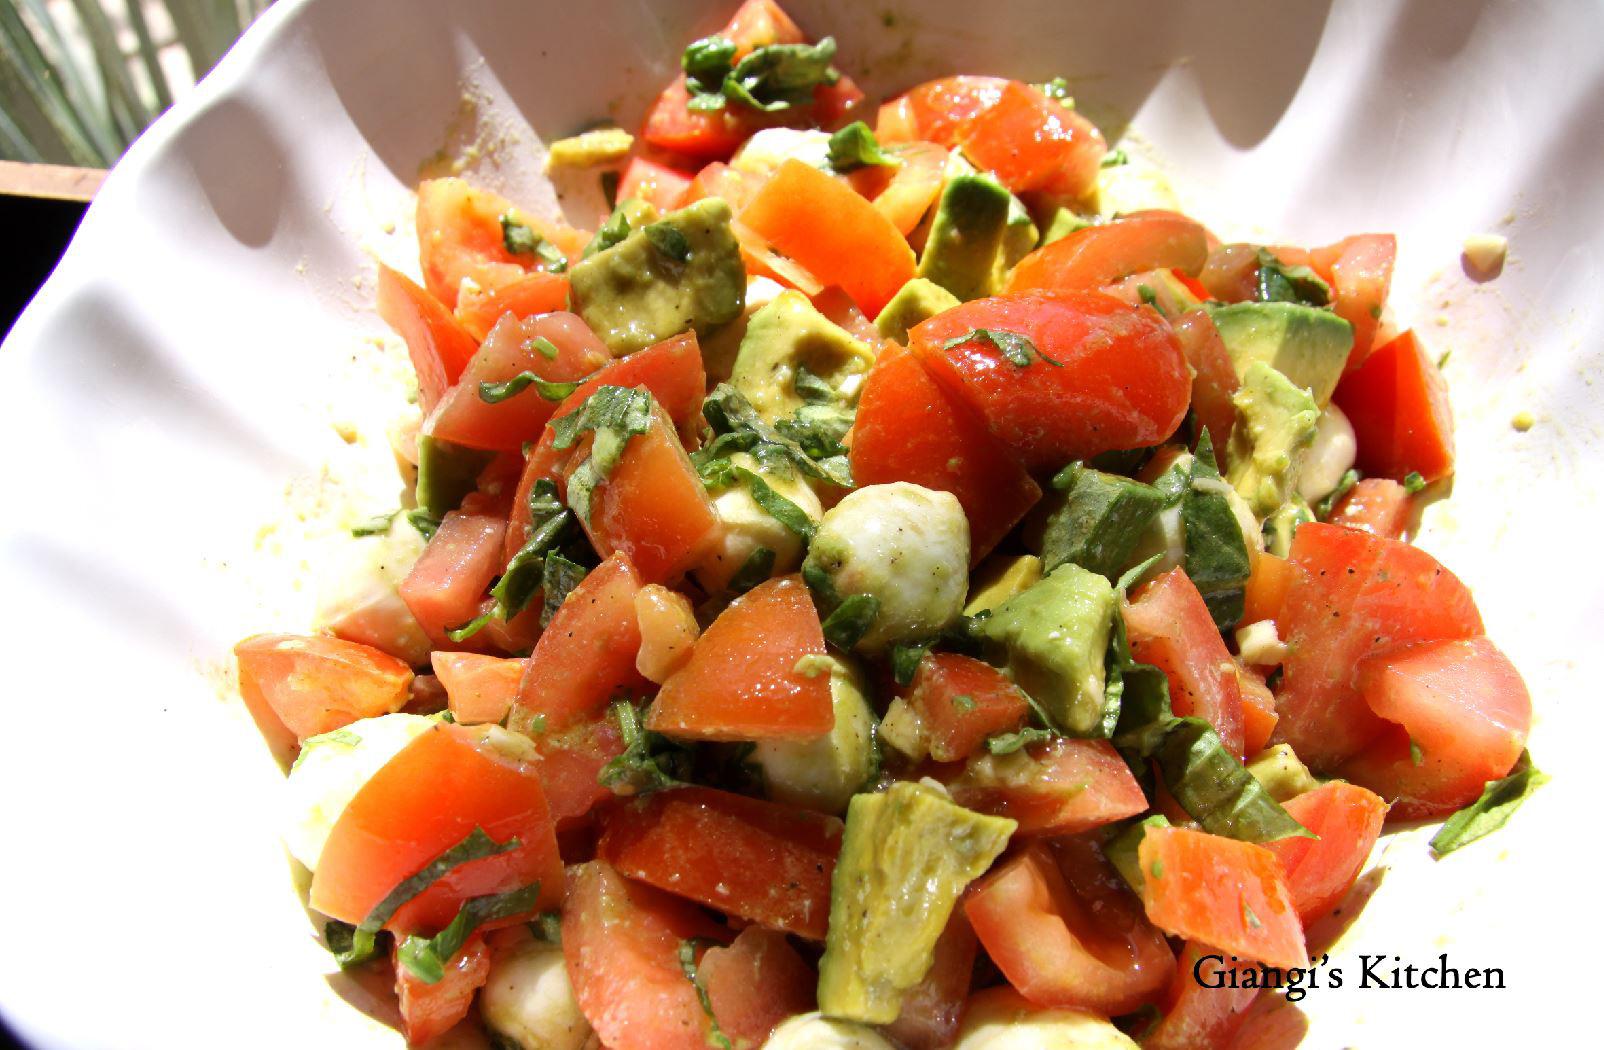 Avocado, mozzarella and tomatoes with vinaigrette 2 copy